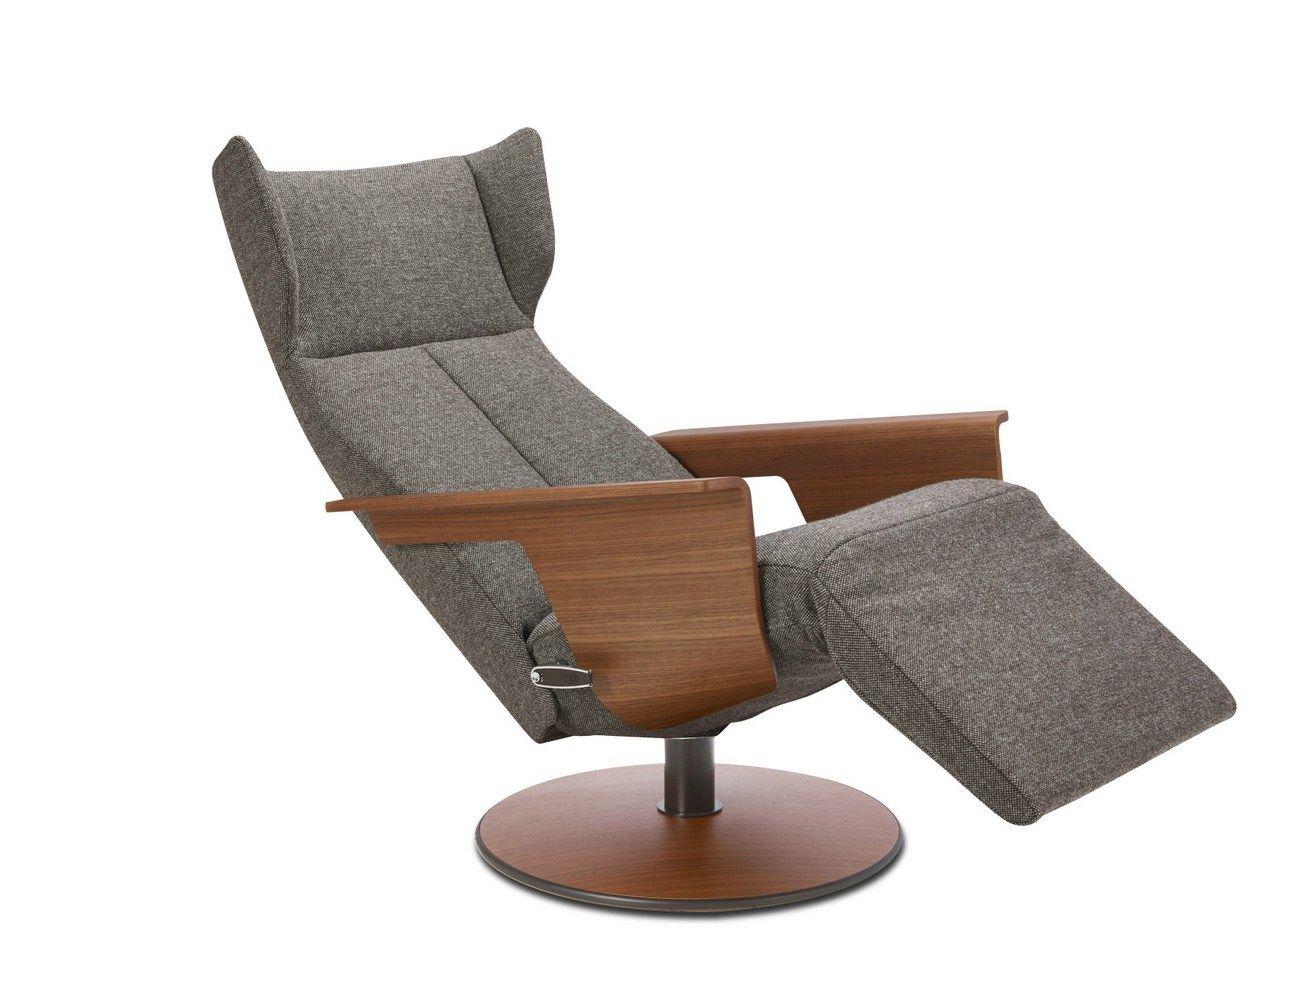 fauteuil inclinable avec repose pieds orea by jori design. Black Bedroom Furniture Sets. Home Design Ideas